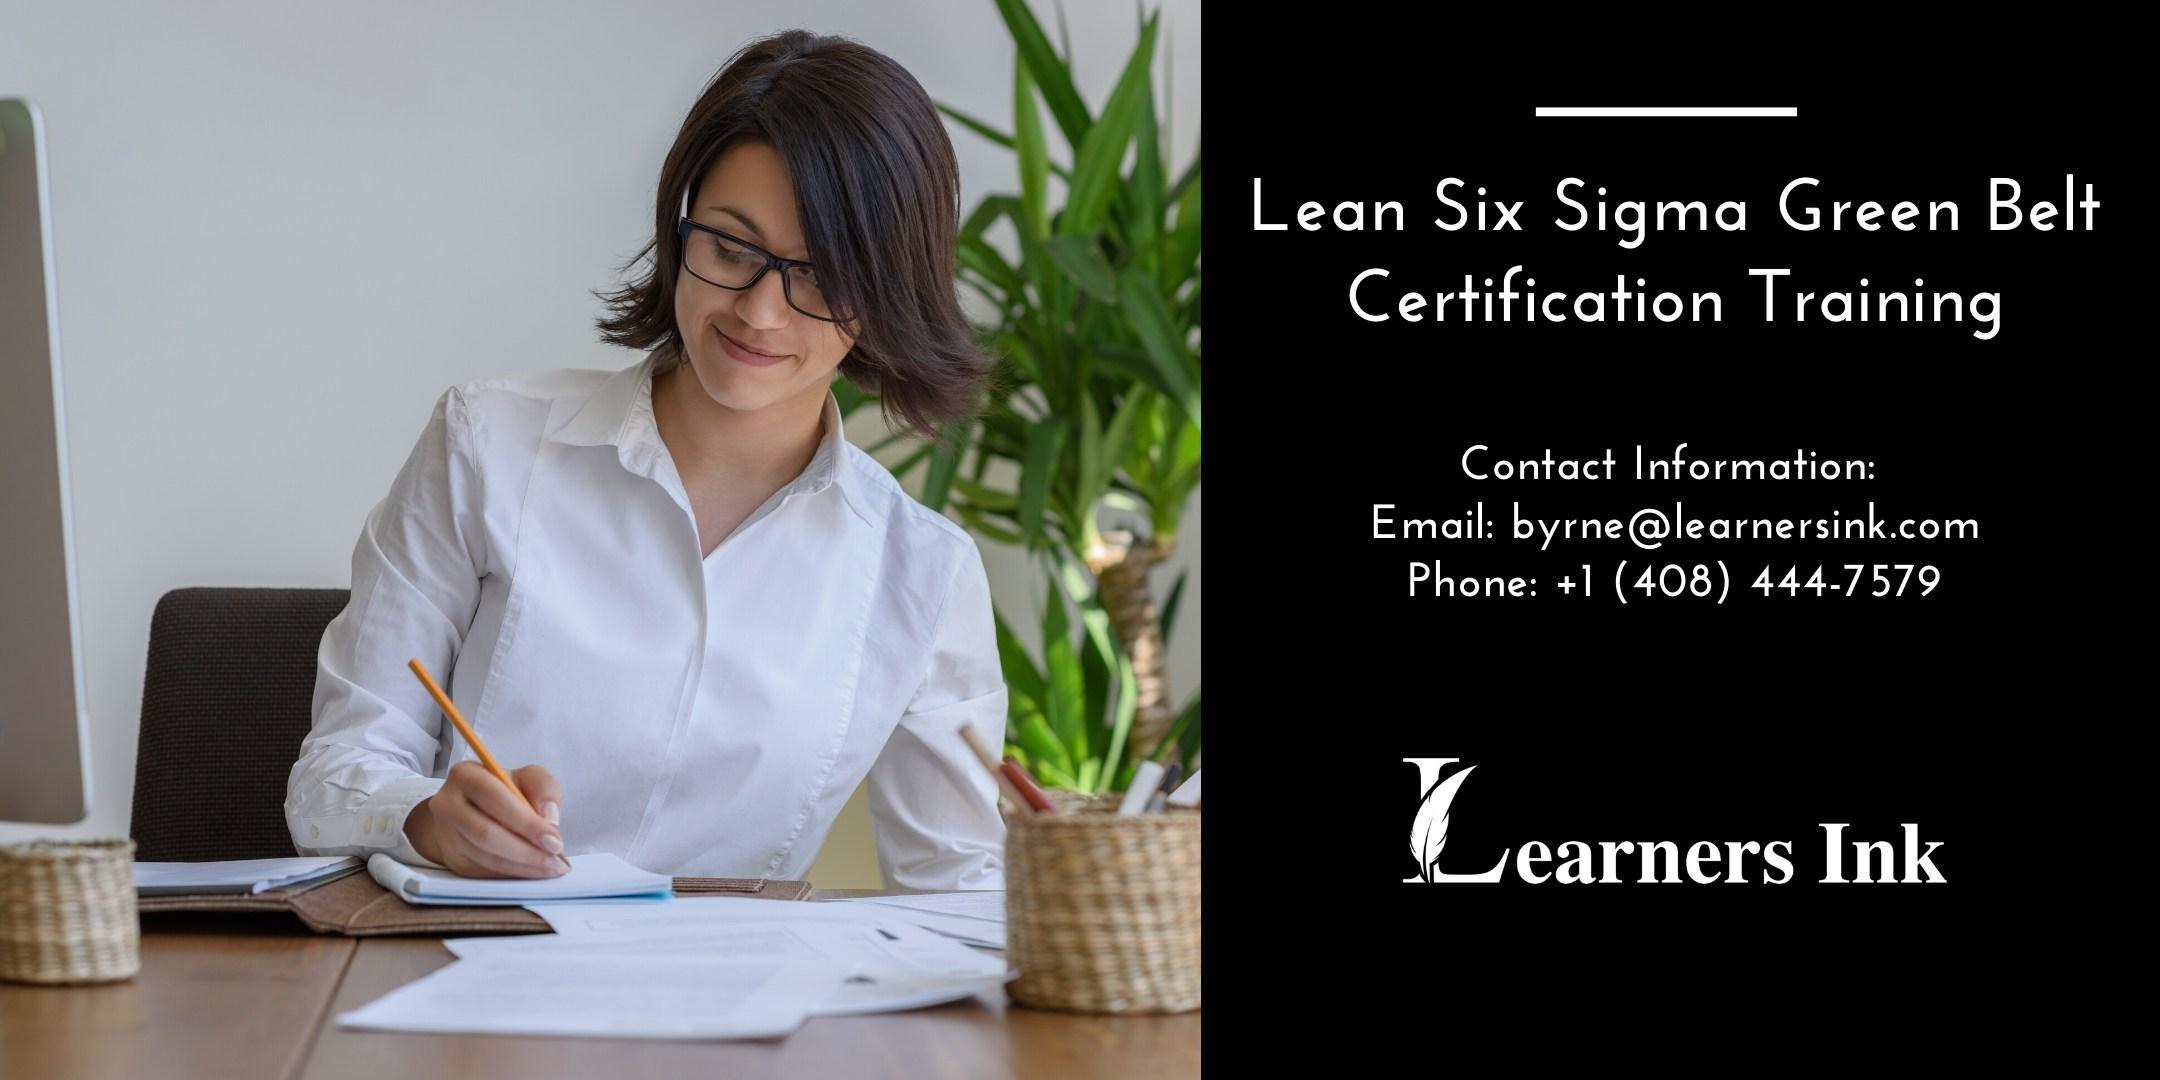 Lean Six Sigma Green Belt Certification Training Course (LSSGB) in Saint John